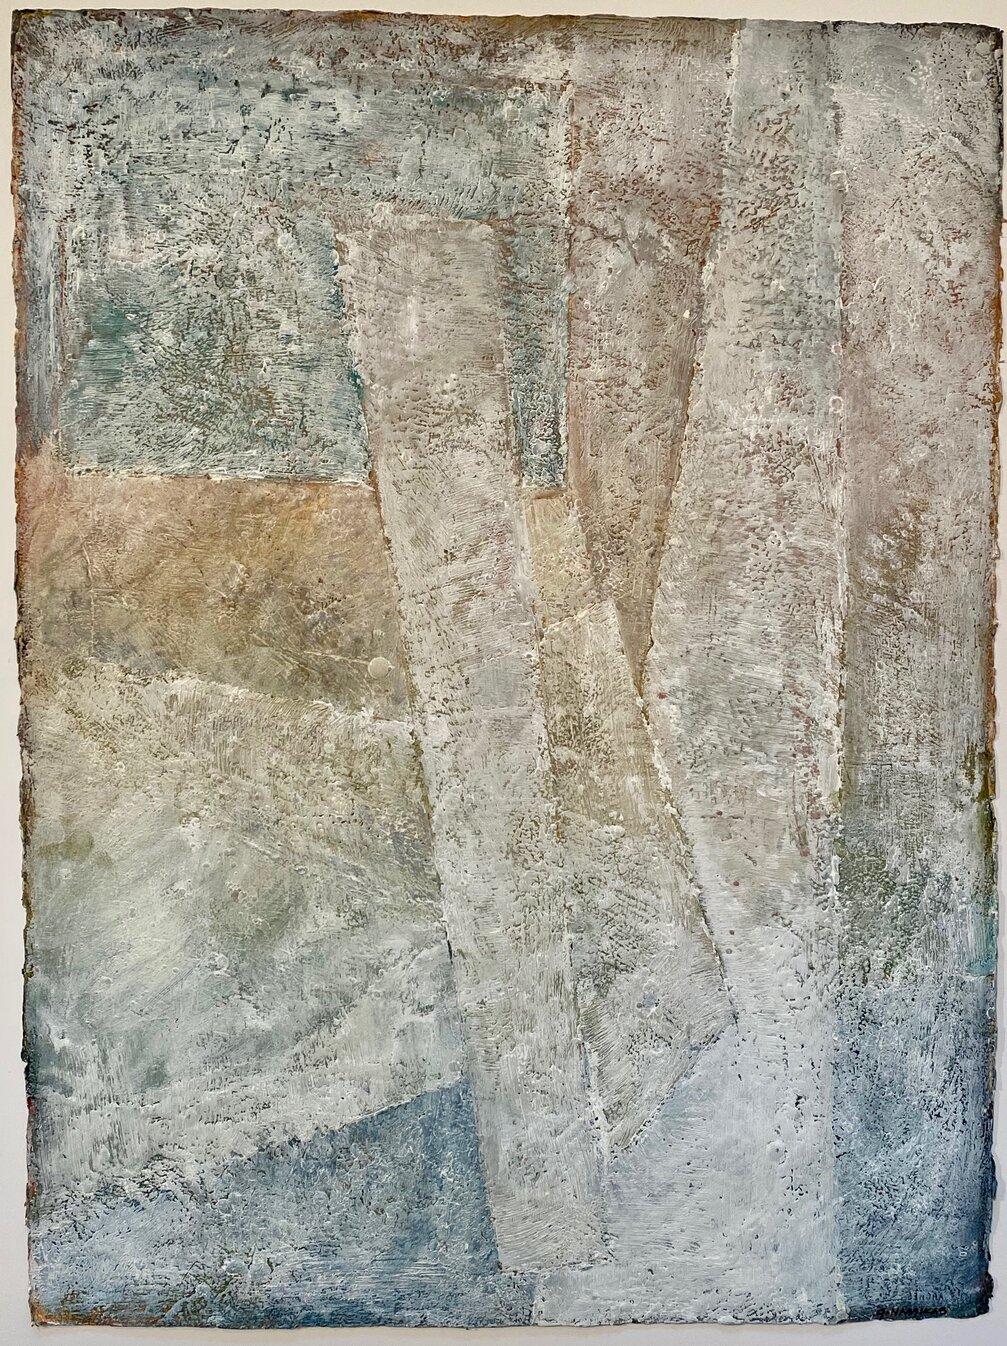 arctic shards iii encaustic on paper 30x22